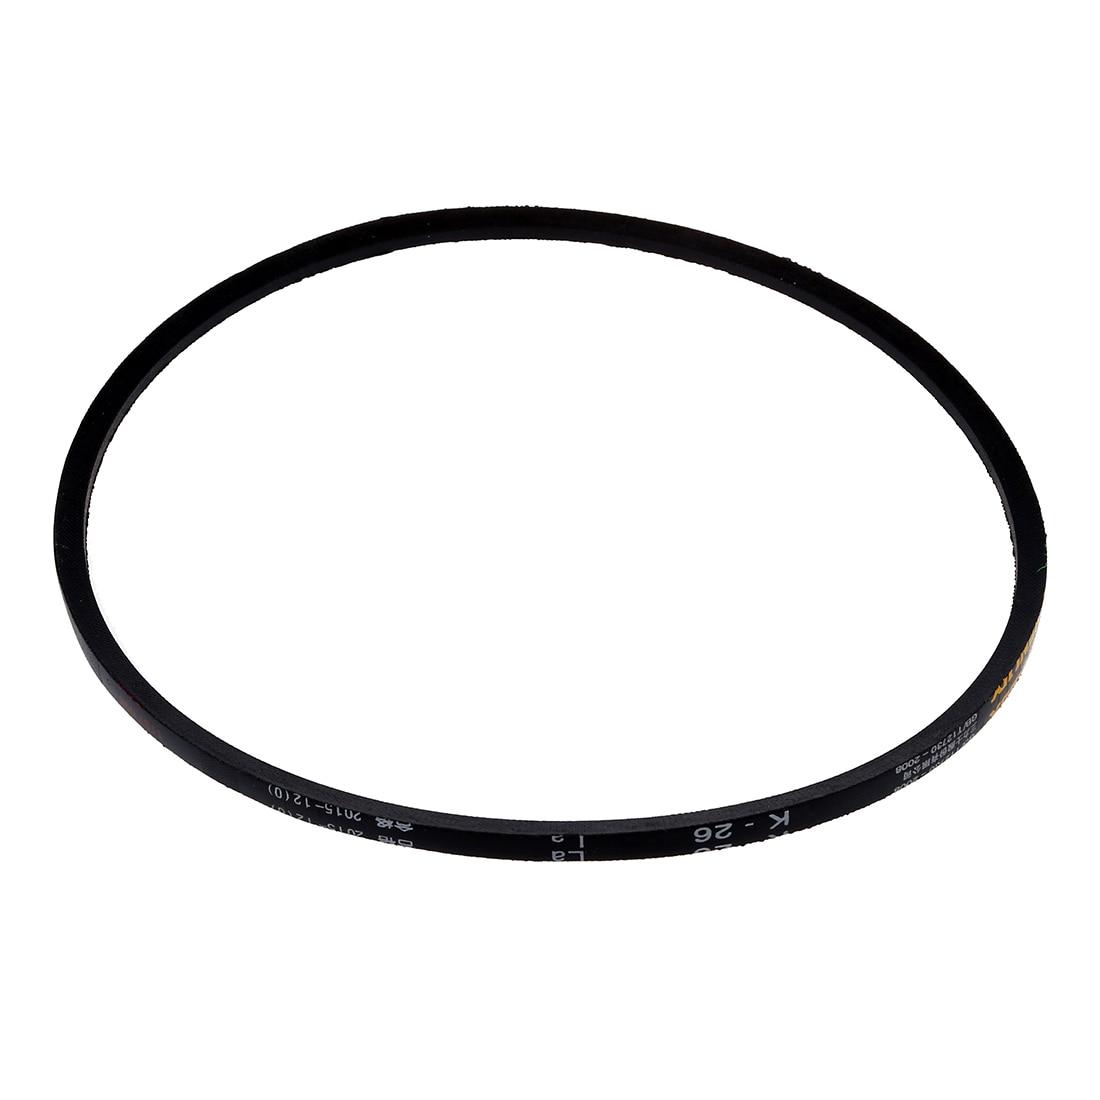 "Gran oferta de la industria de césped de caucho negro de tipo K Vee V cinturón 5/16 ""x 26"" de K-26"